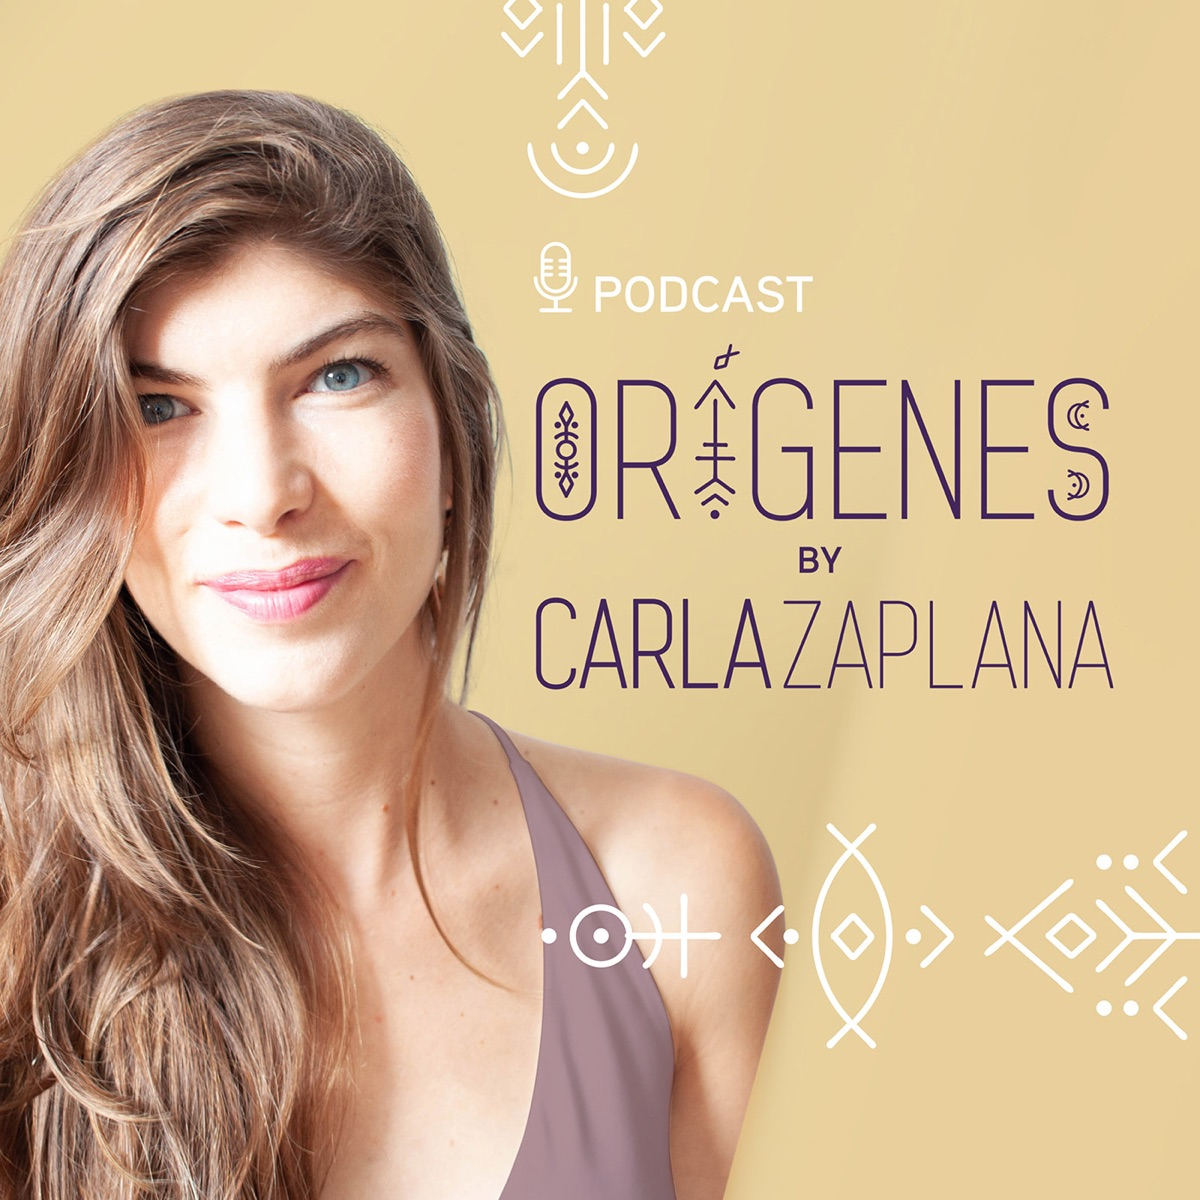 CARLA ZAPLANA : ORIGENES